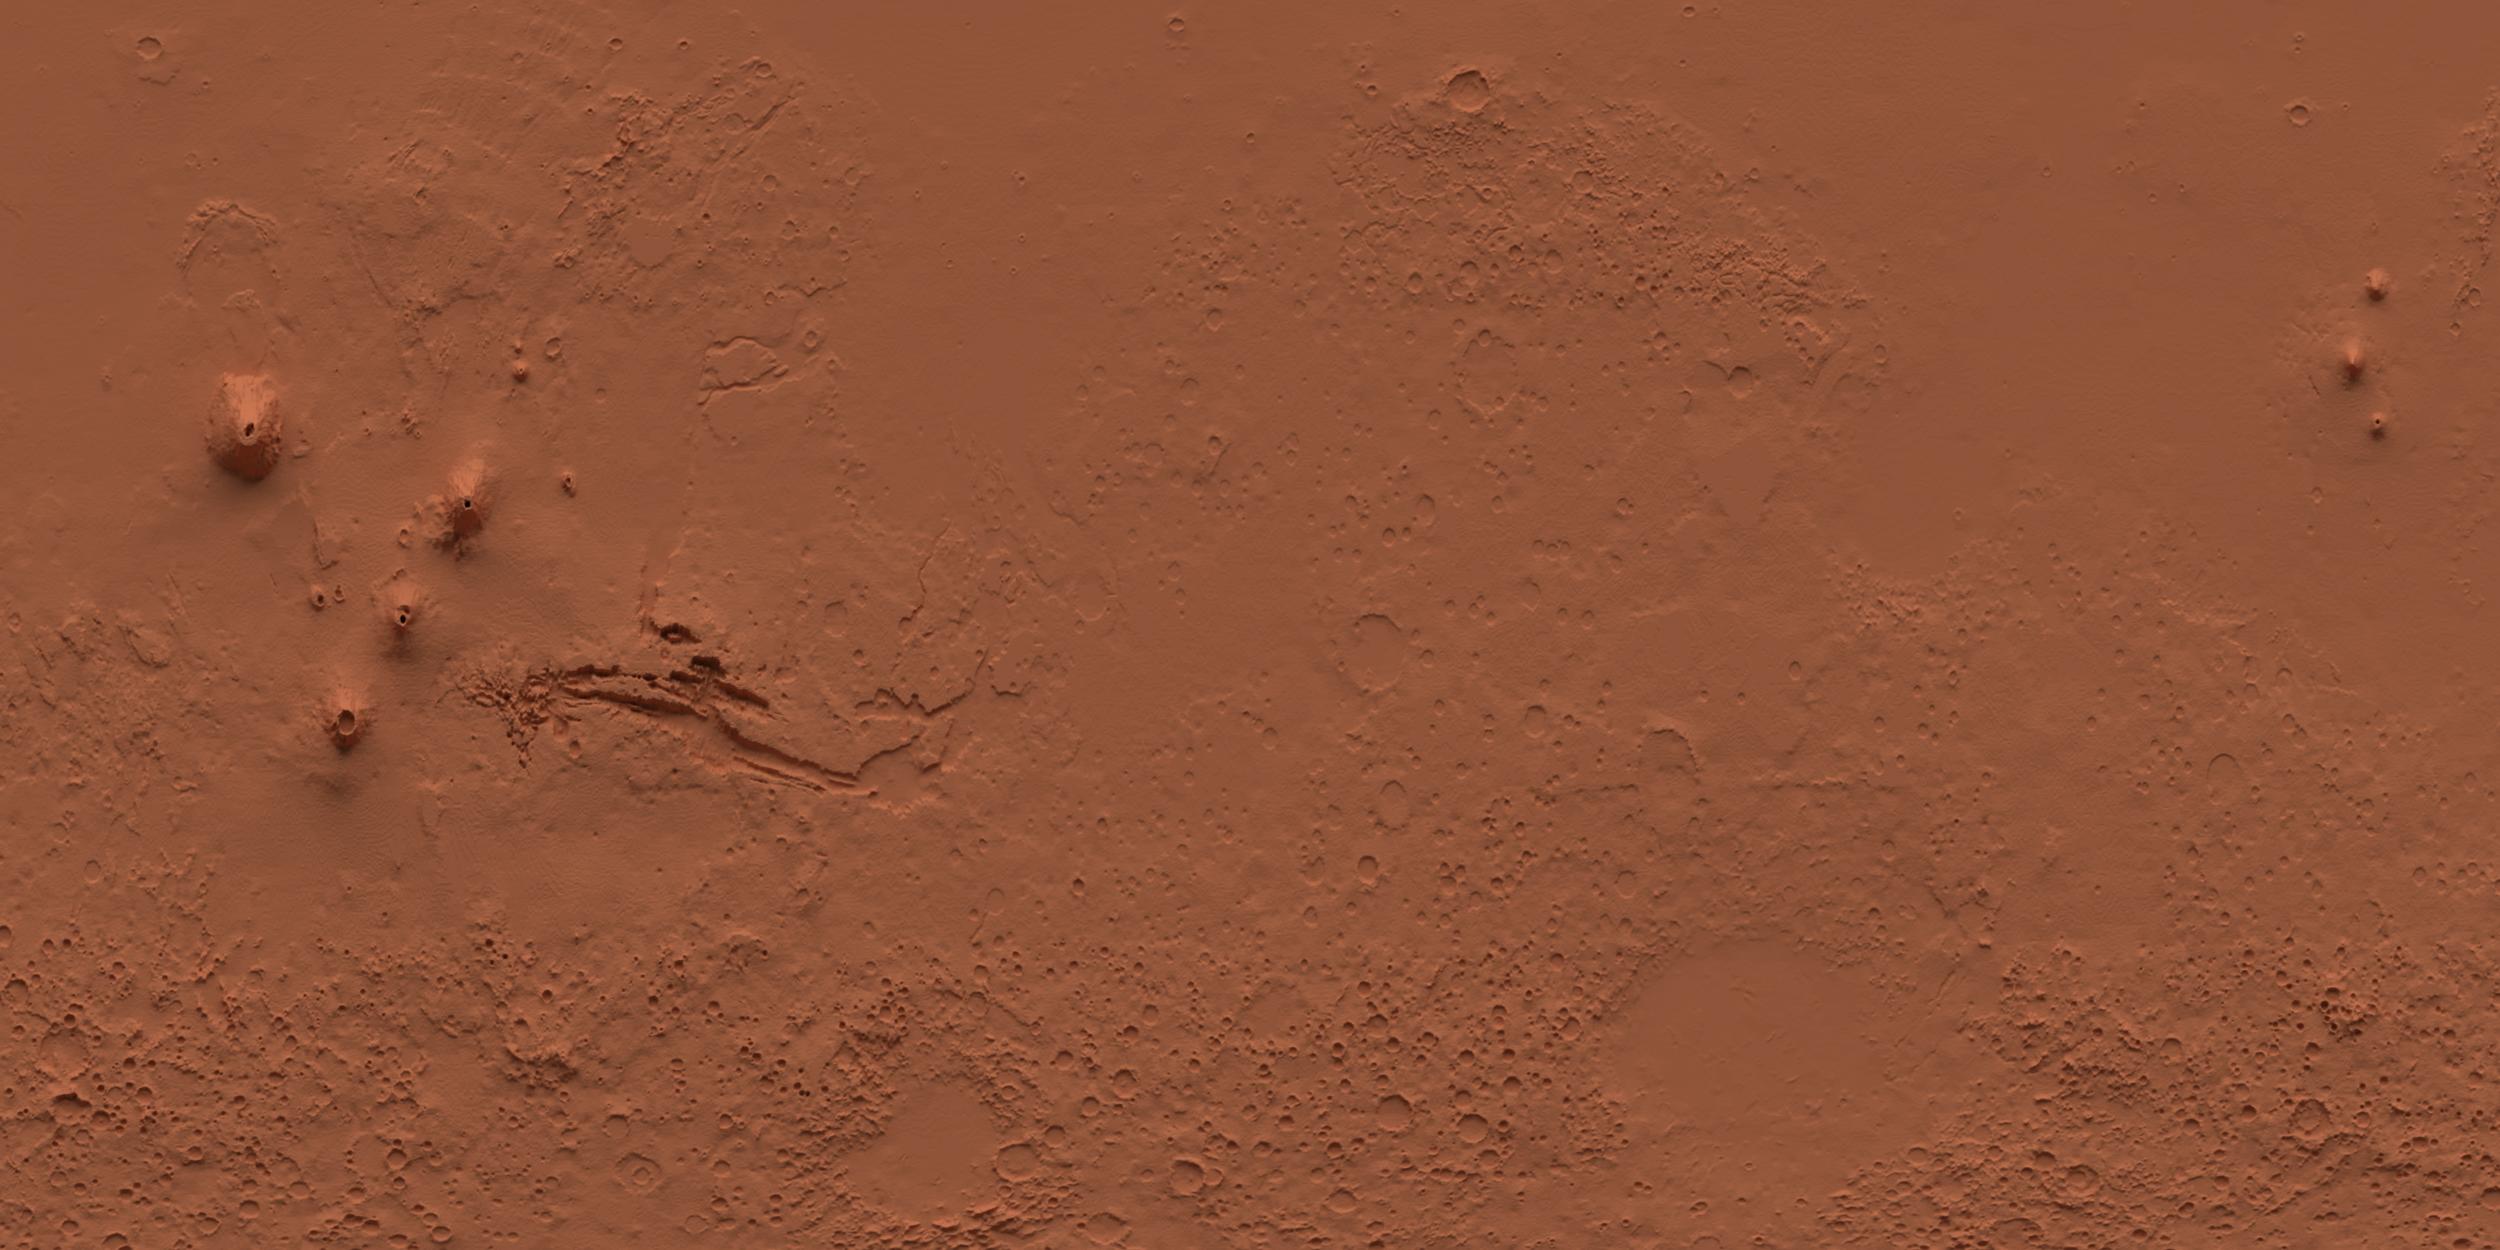 mars terrain render